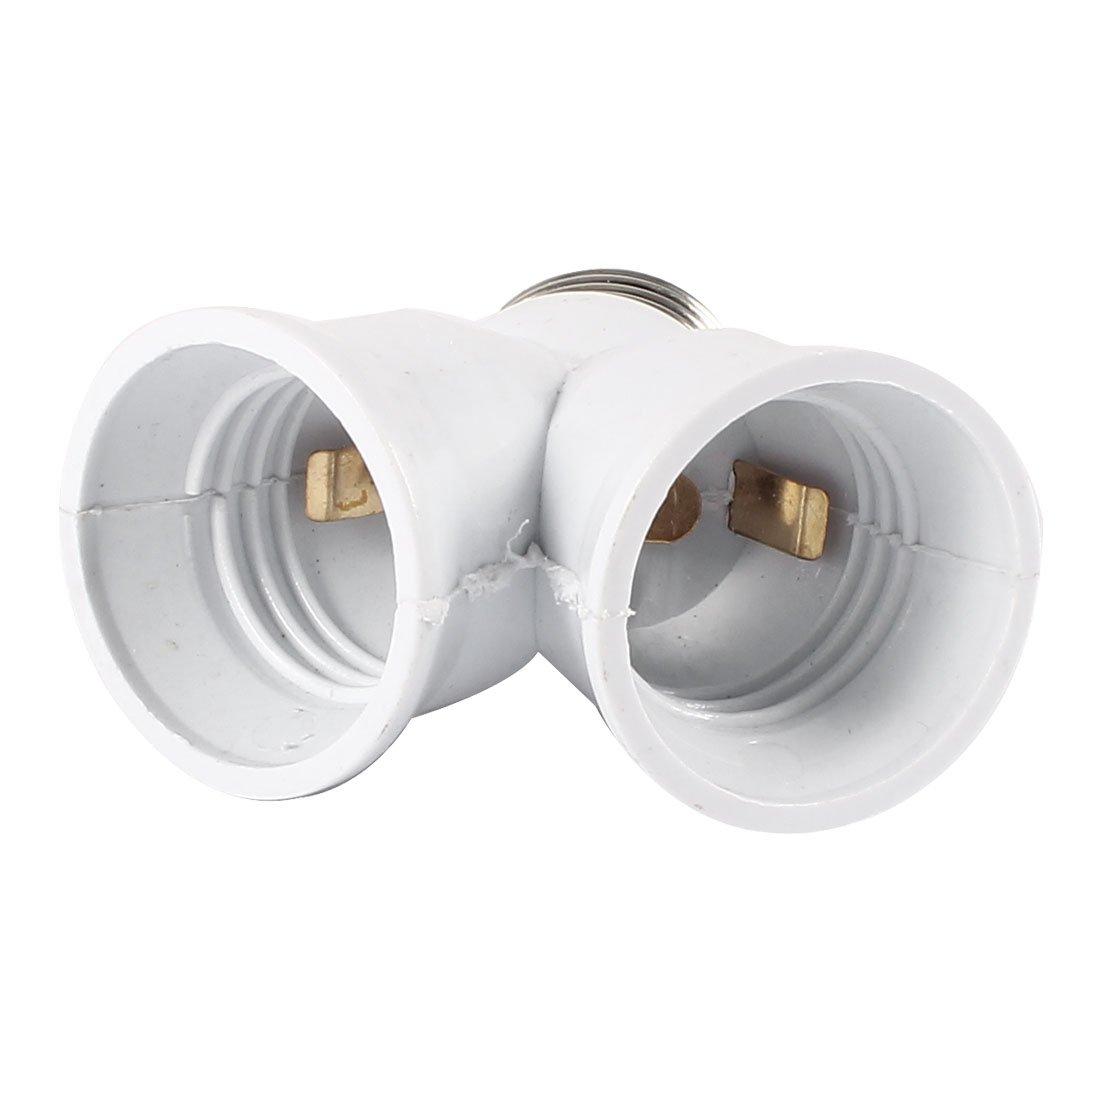 E27 To E27 Light Lamp Bulb Socket 2 Splitter Convertor - Y Bulb Adapter -  Amazon.com